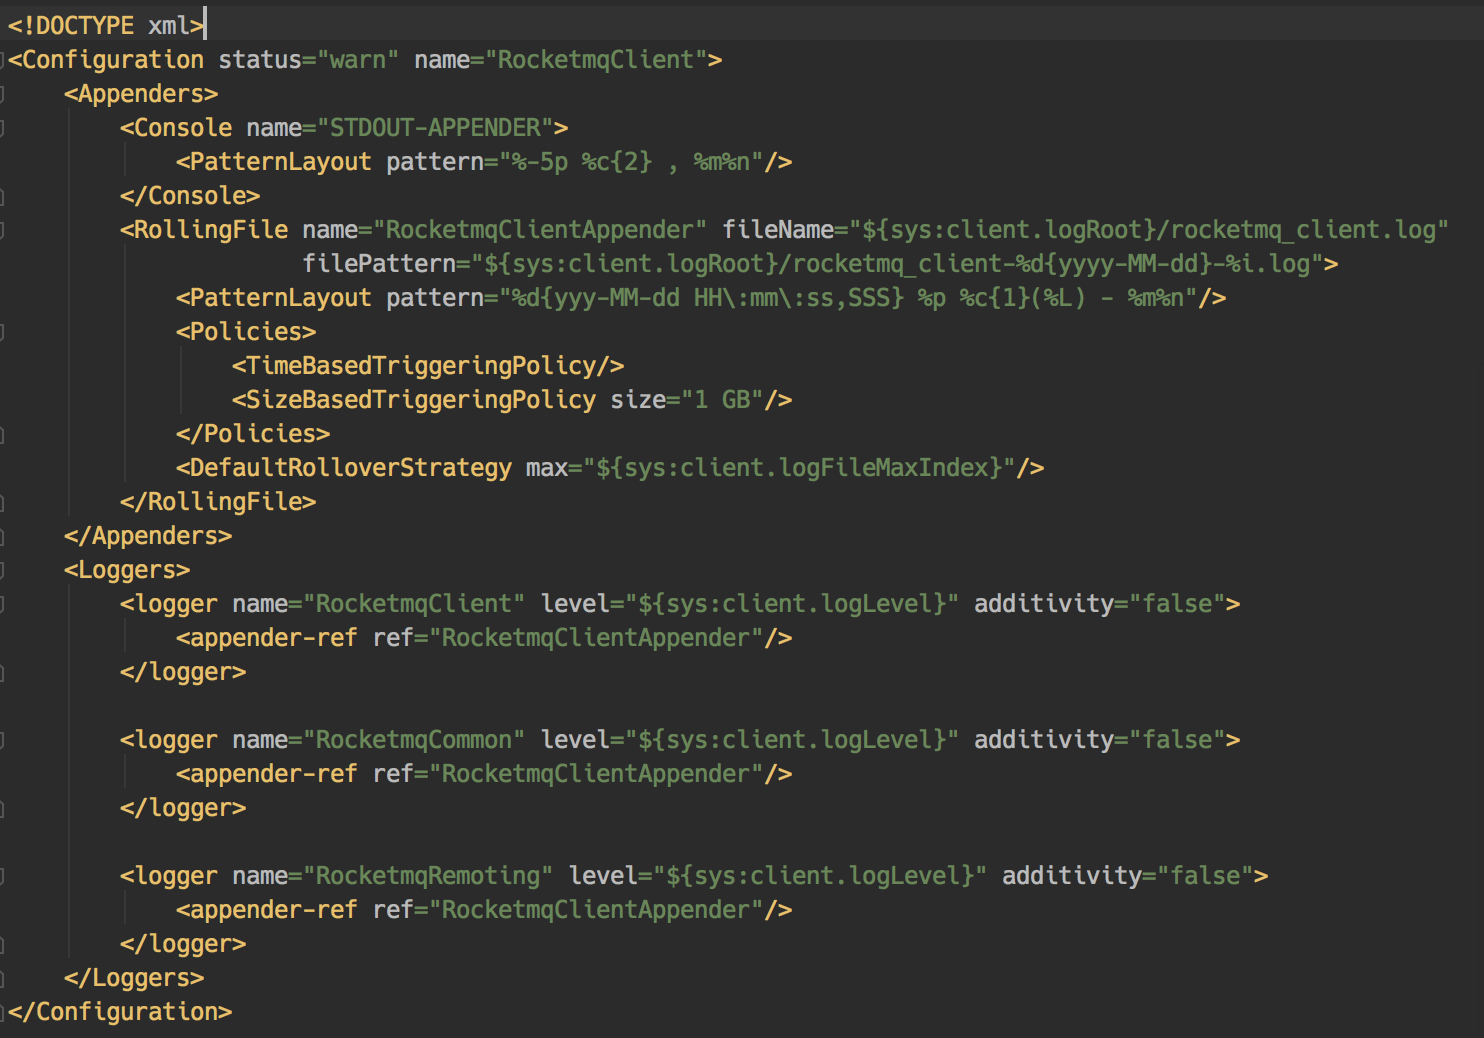 log4j2_rocketmq_client